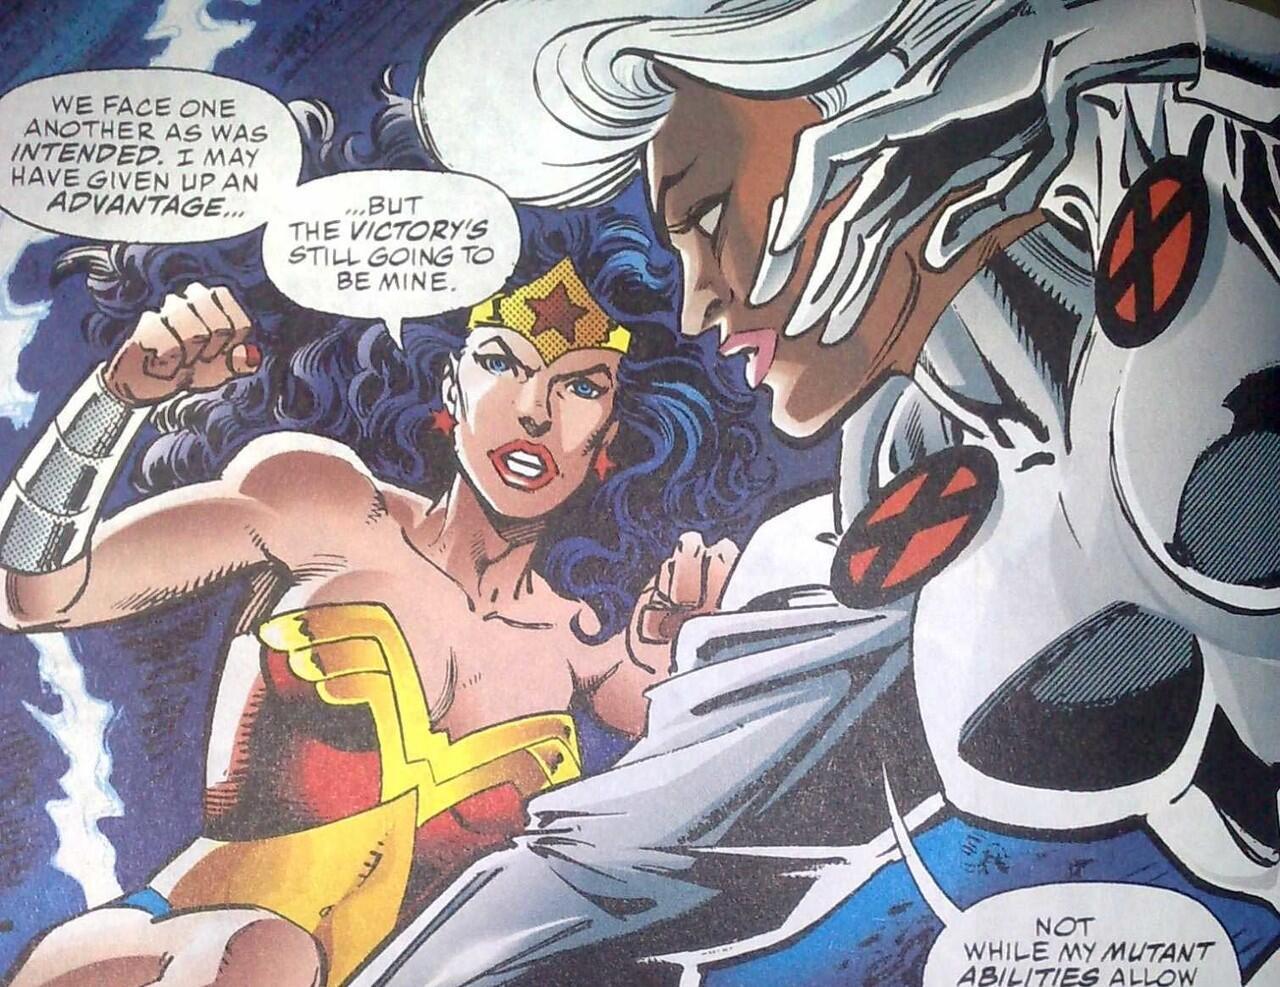 Fantastic 5 : Inilah 5 'Epic Battle' Antara Superhero DC & Marvel!